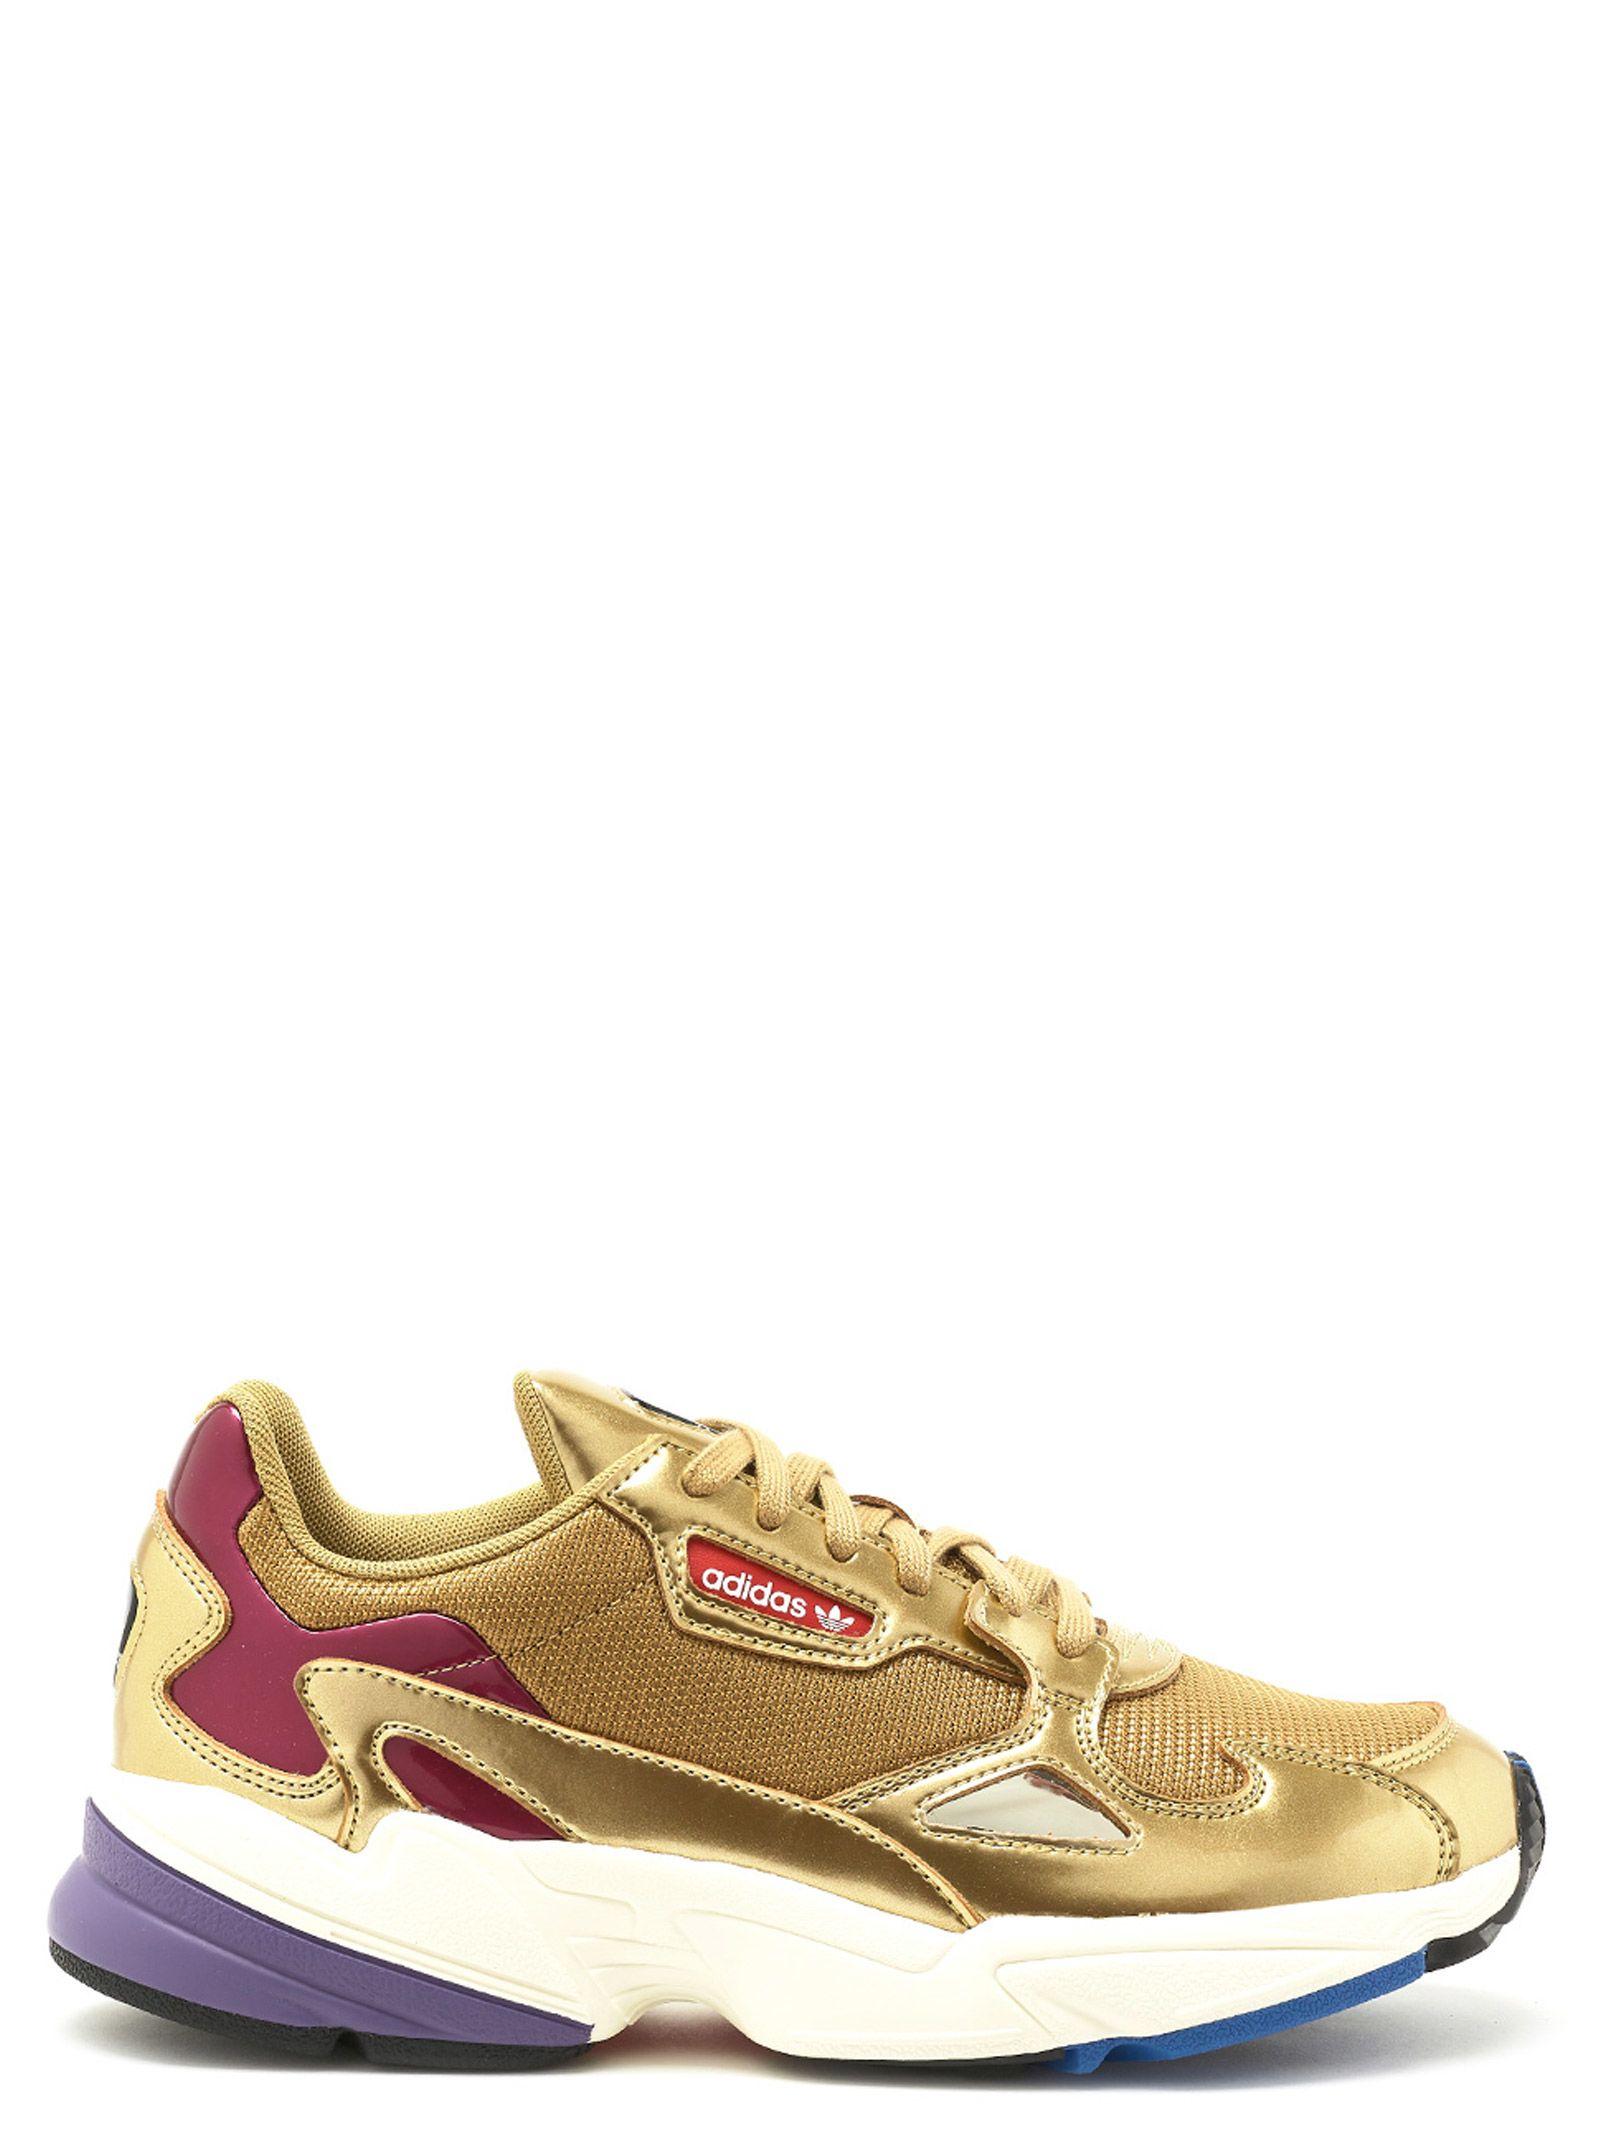 8f465fb7bbb25 Adidas Originals Adidas Originals  falcon W  Shoes - Gold - 10789594 ...